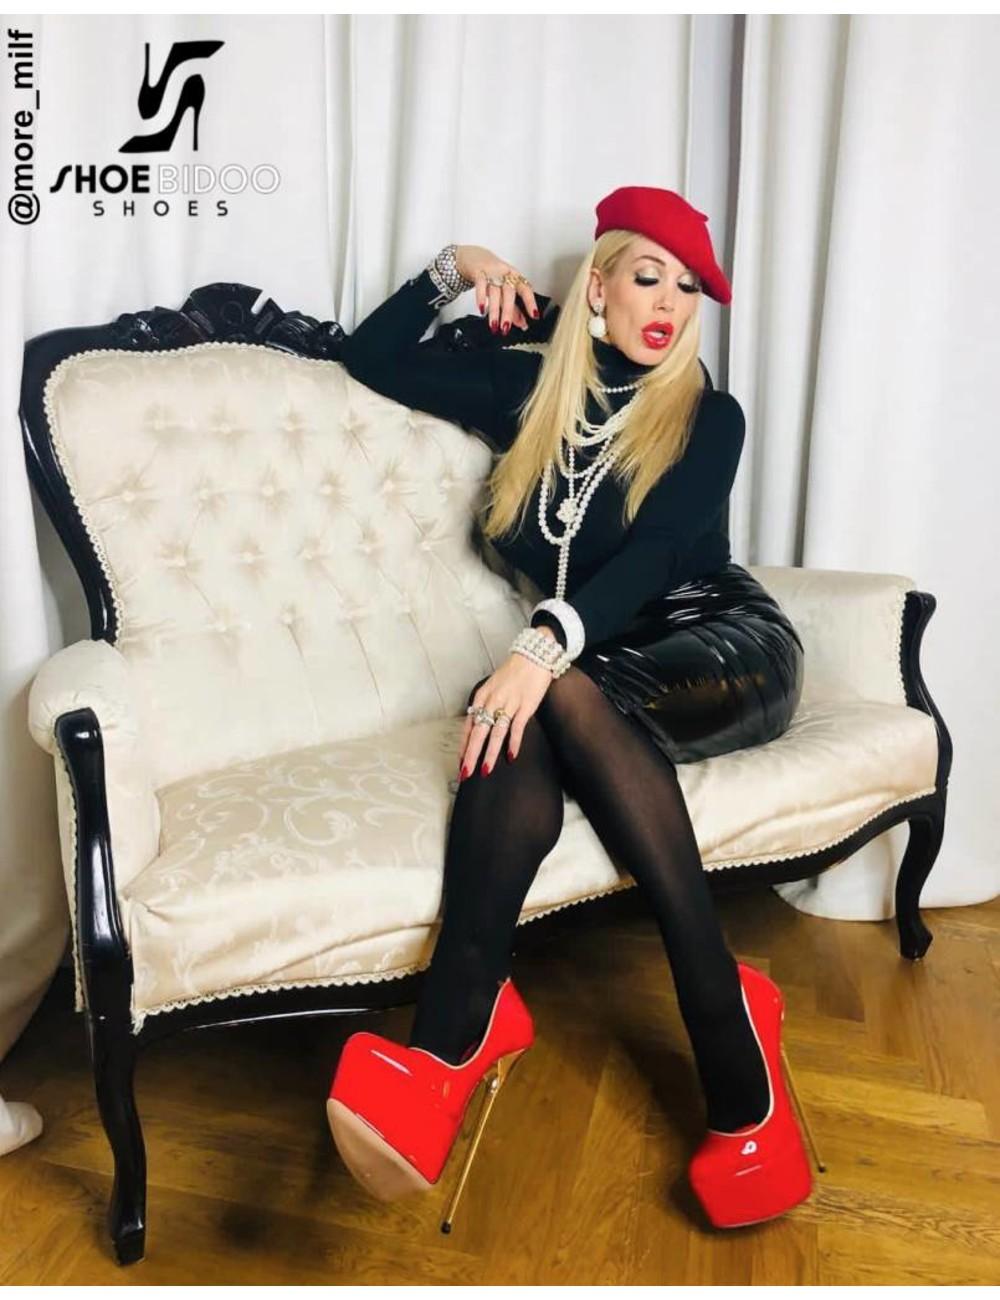 Giaro Rebecca More in unserem roten Fetisch Giaro BABY Heels - Copy